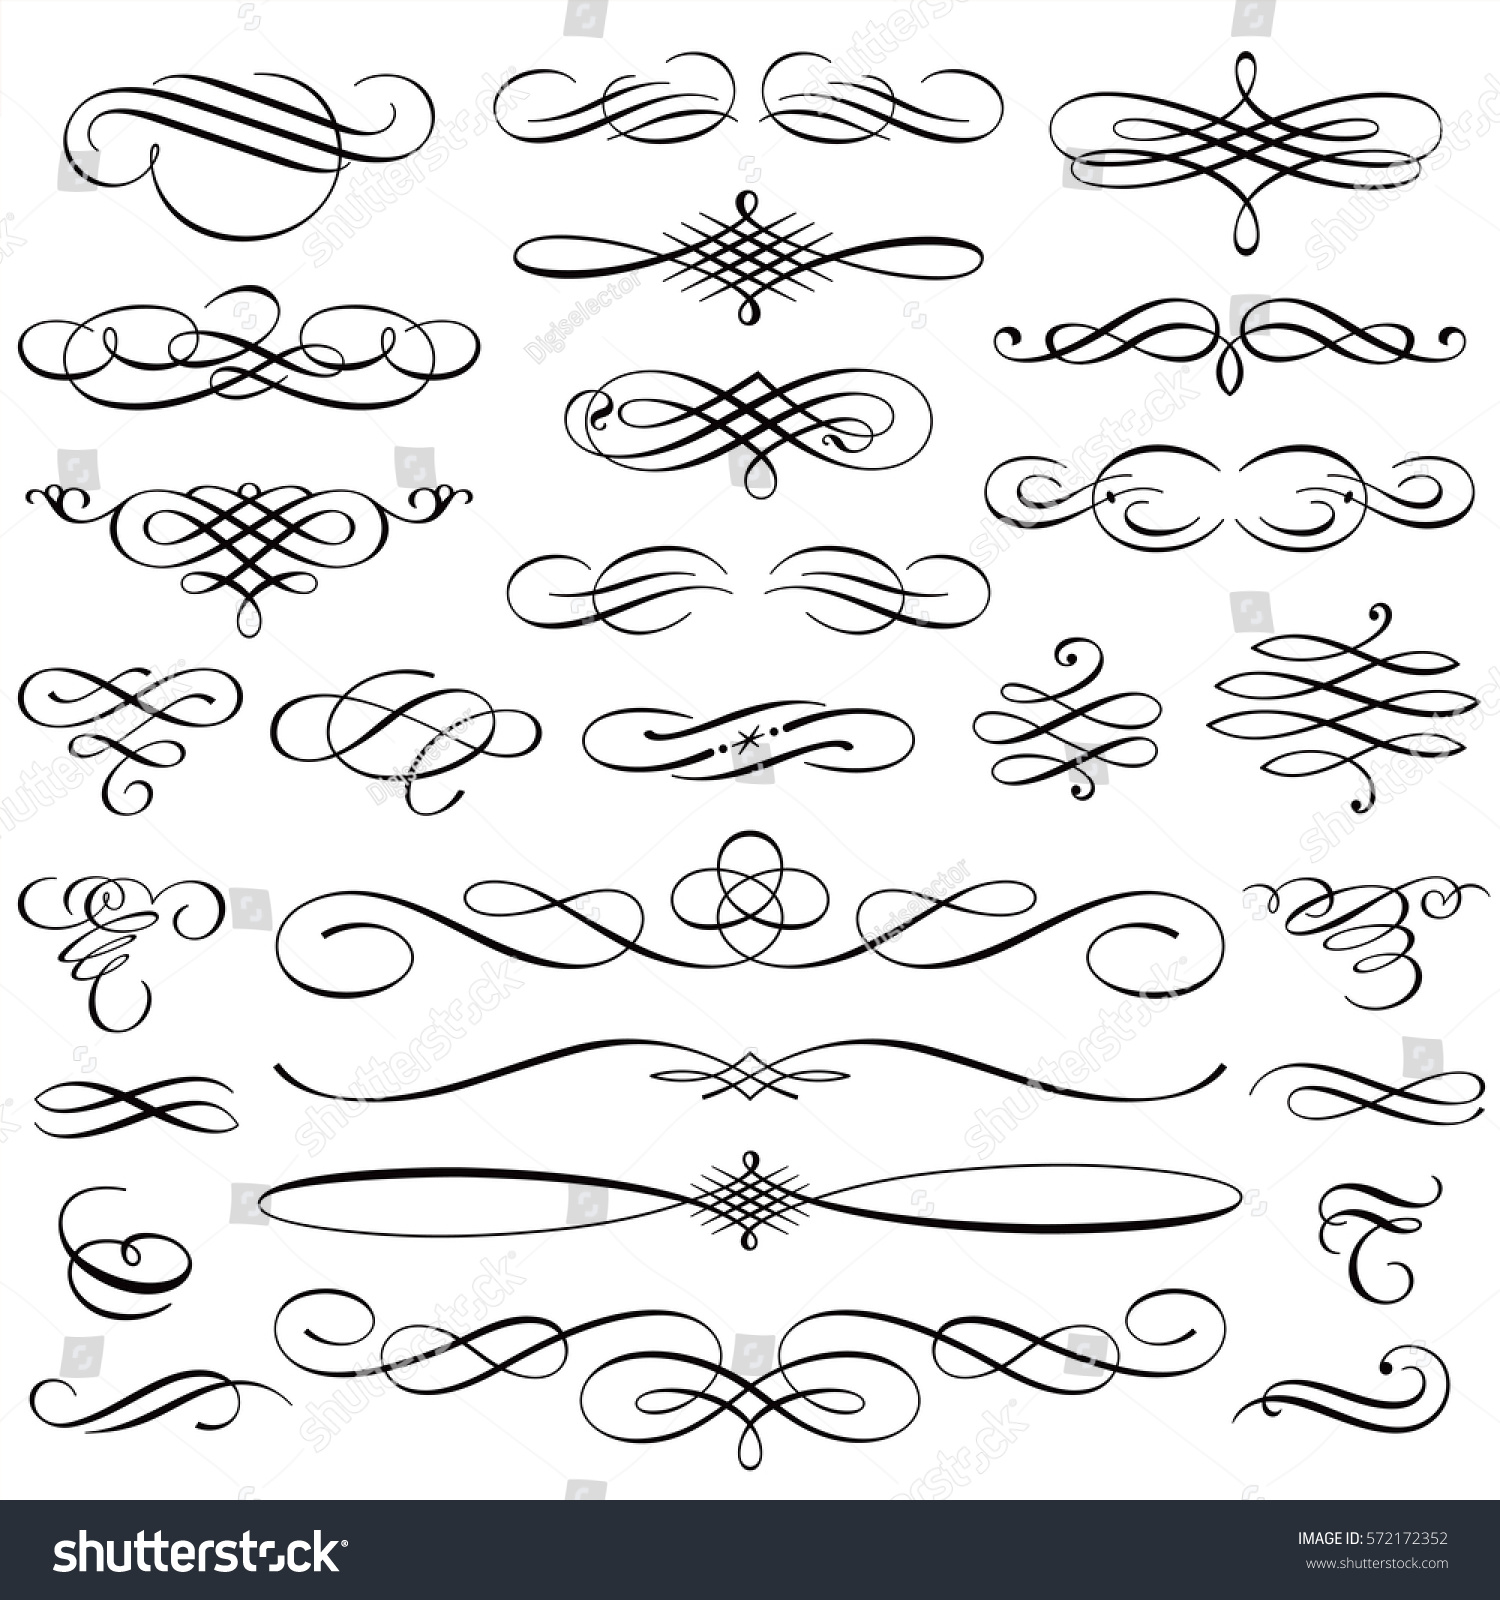 Vintage Calligraphic Design Elements Swirls Vignettes Stock Vector 572172352 Shutterstock